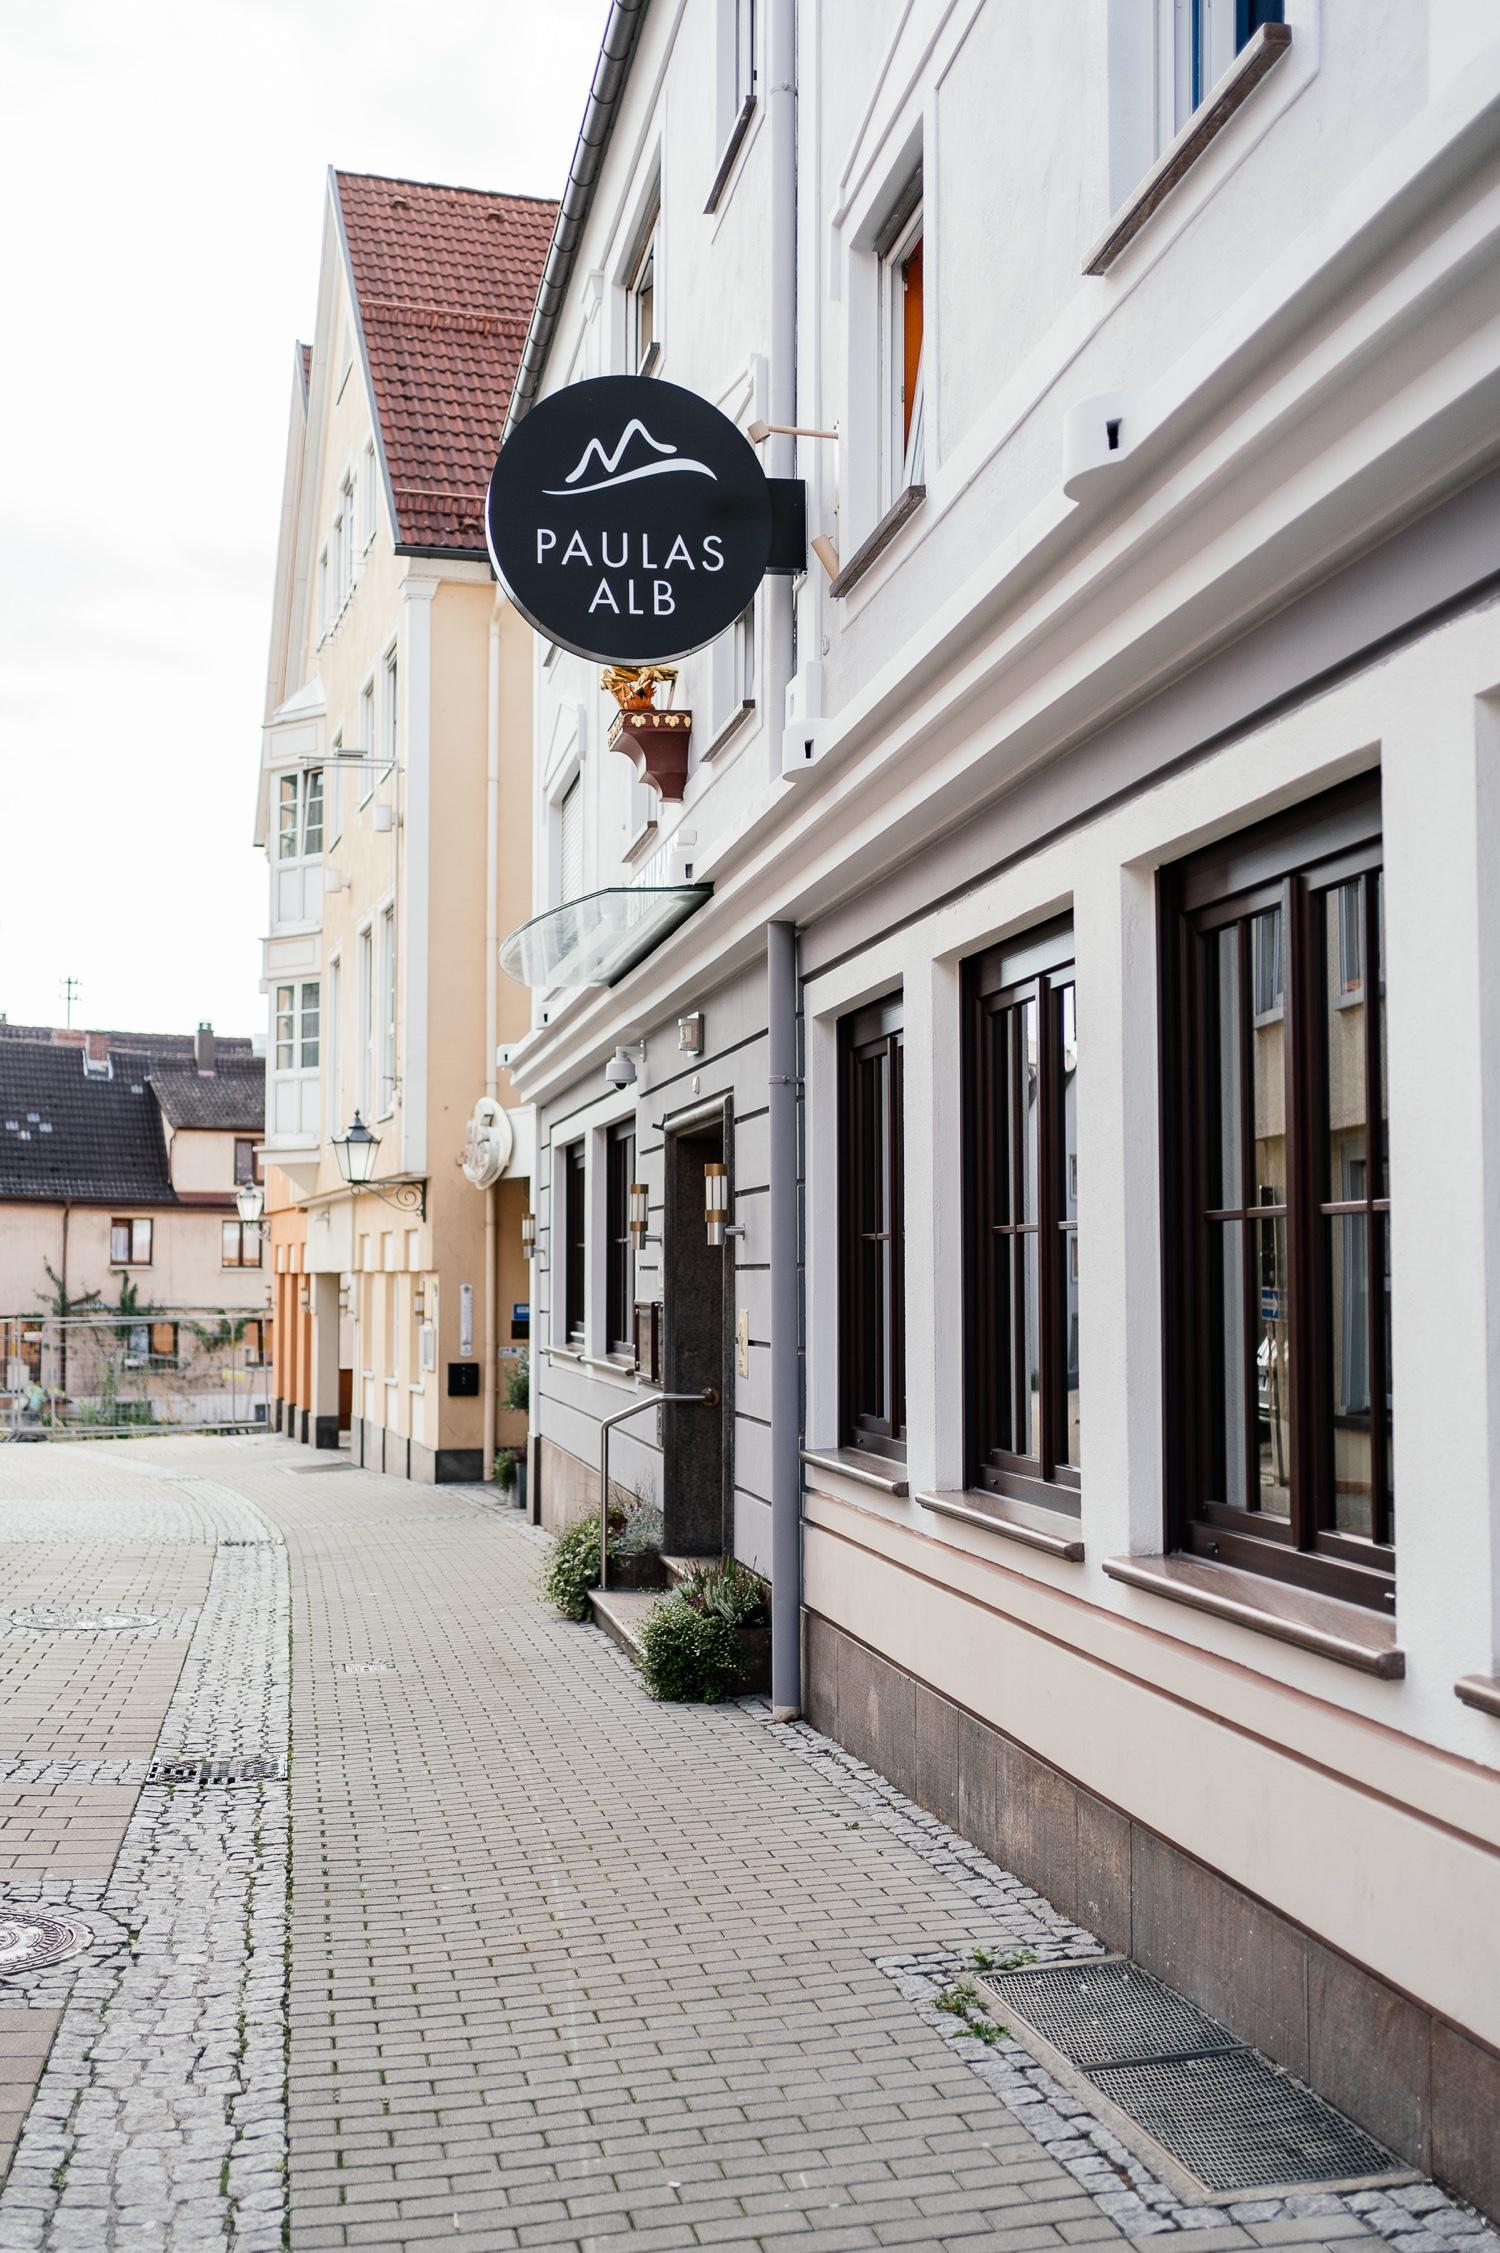 Alb Location Ehingen